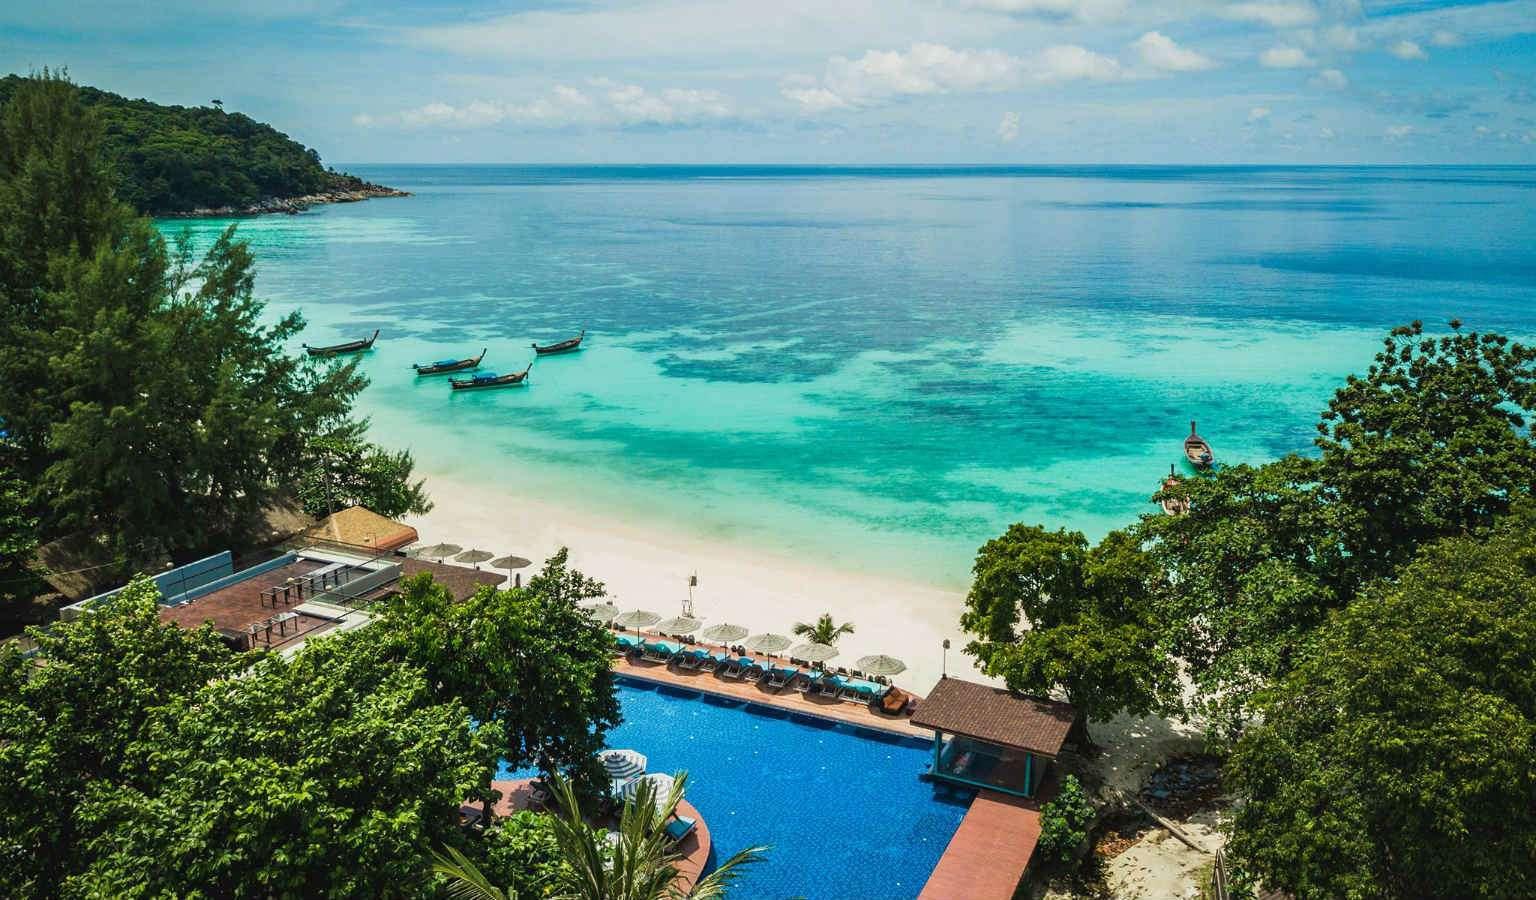 Pattaya Beach in Ko Lipe, Thailand